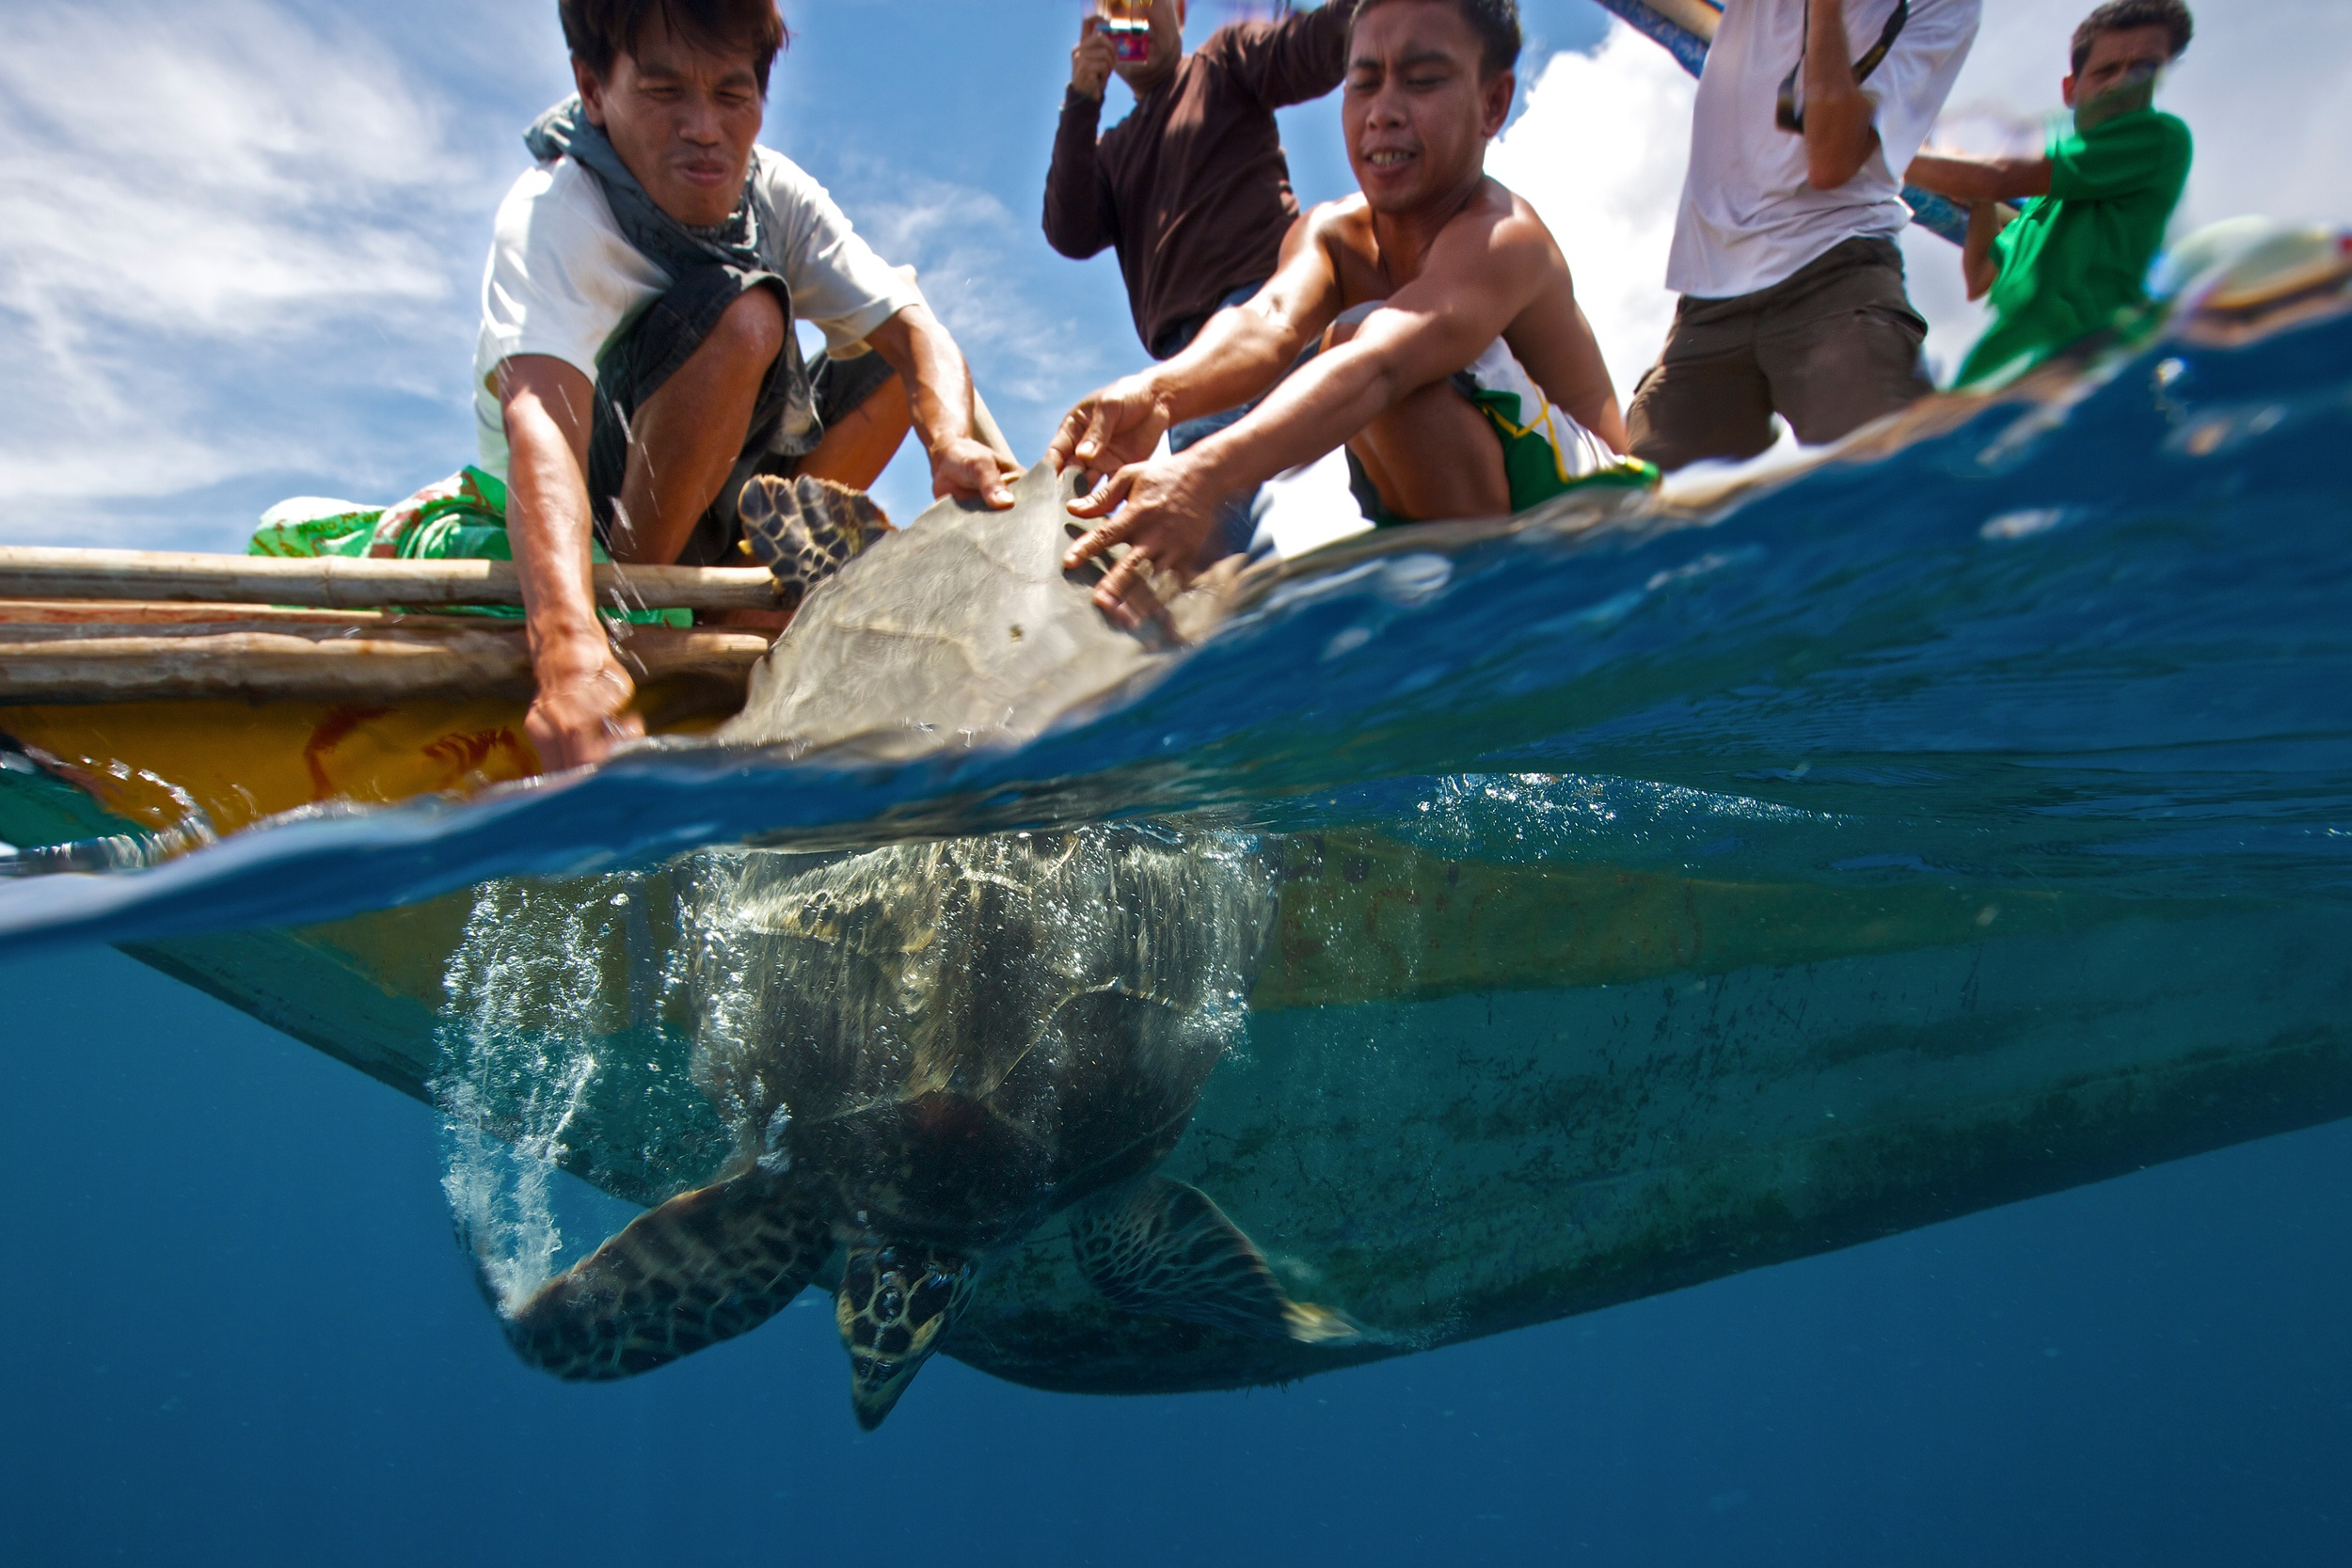 Turtle release in Alcantara, Cebu, Philippines (Photo: Steve De Neef)